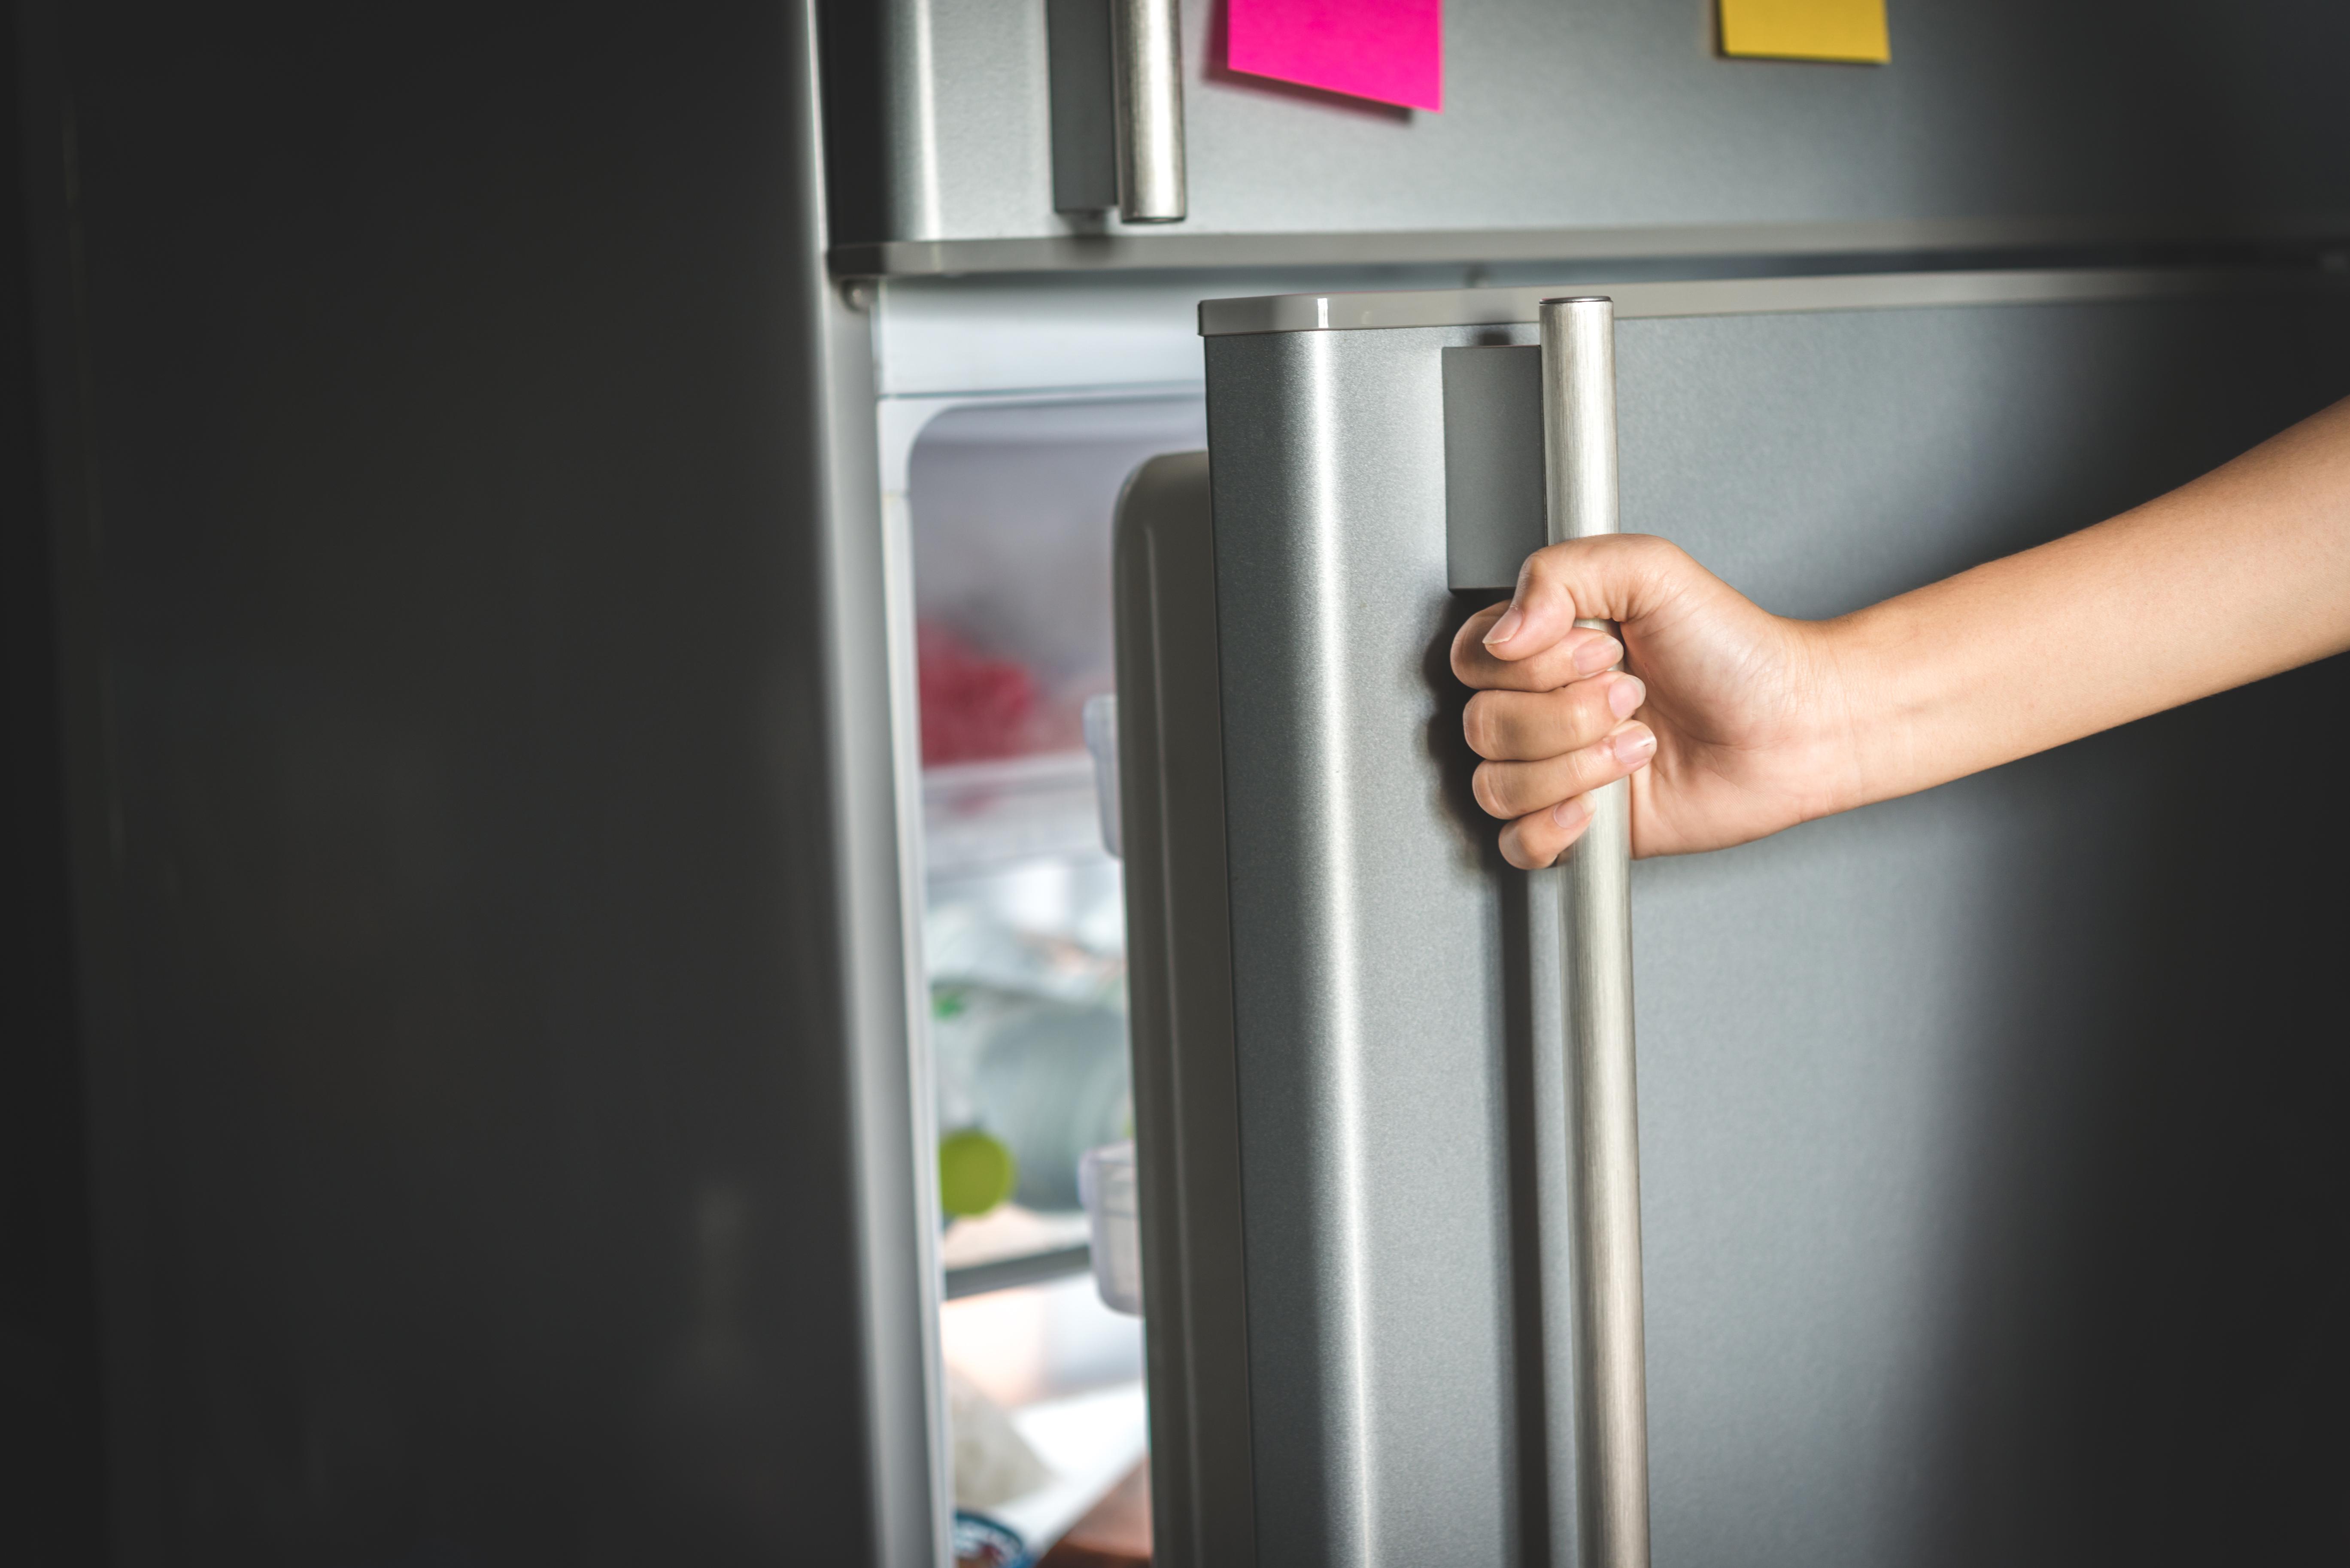 refridgerator fridge opening